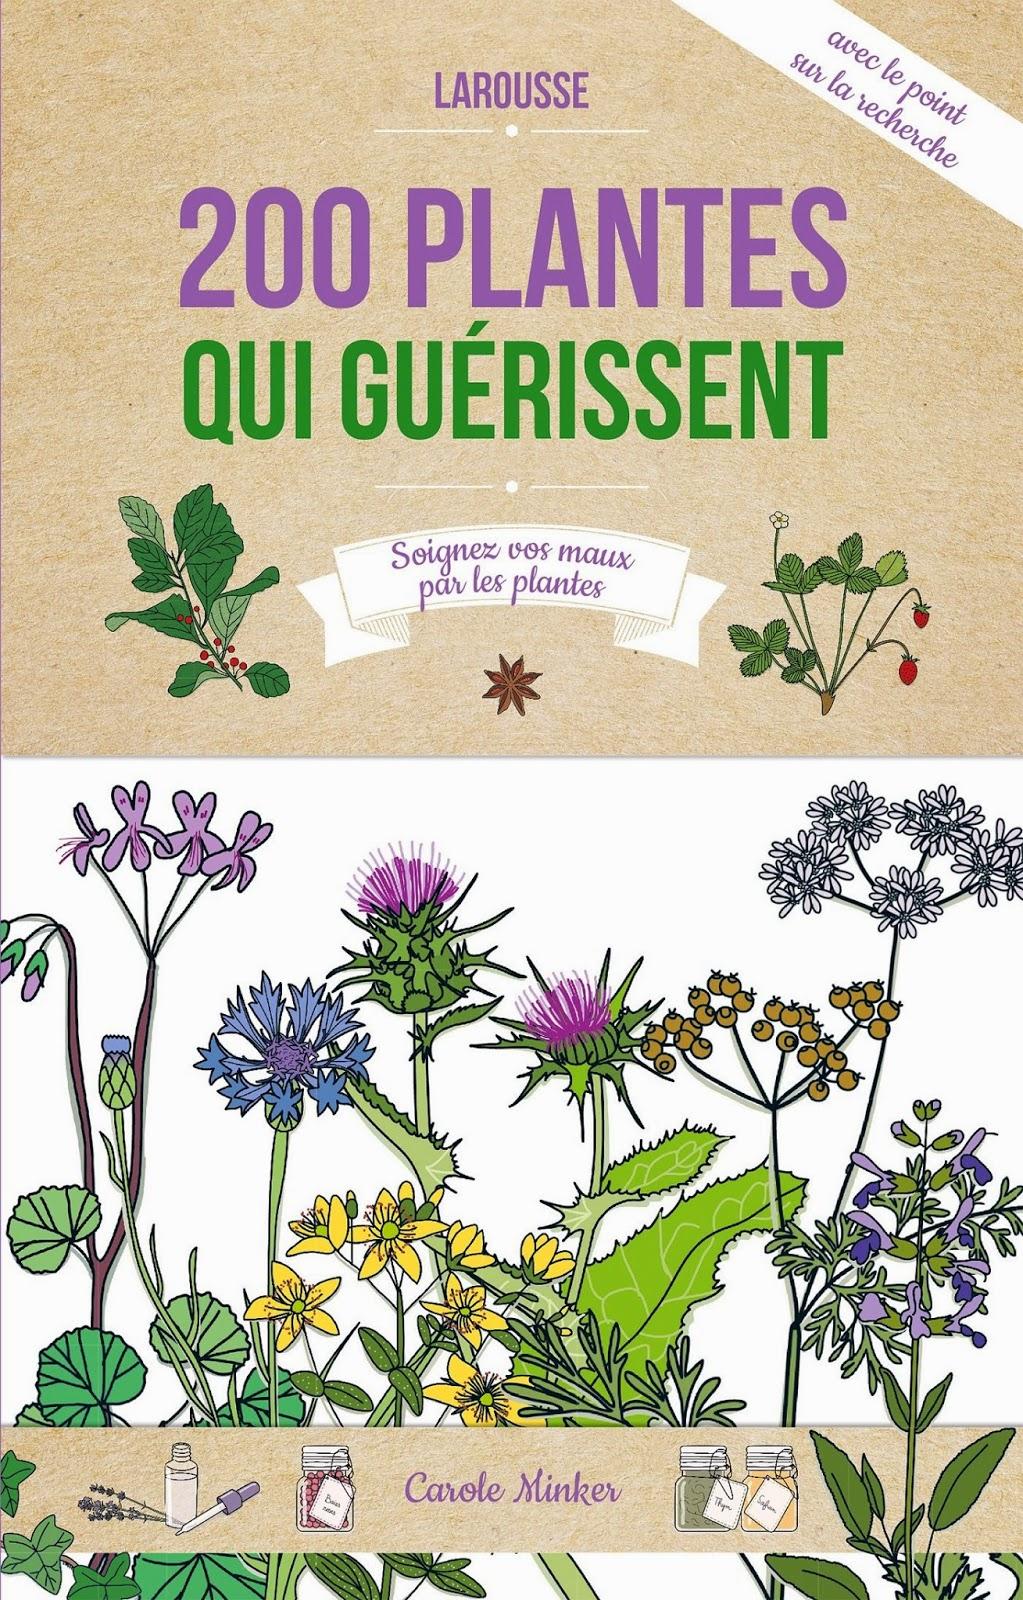 http://www.amazon.fr/200-plantes-gu%C3%A9rissent-Carole-Minker/dp/203587985X/ref=sr_1_1?s=books&ie=UTF8&qid=1427728061&sr=1-1&